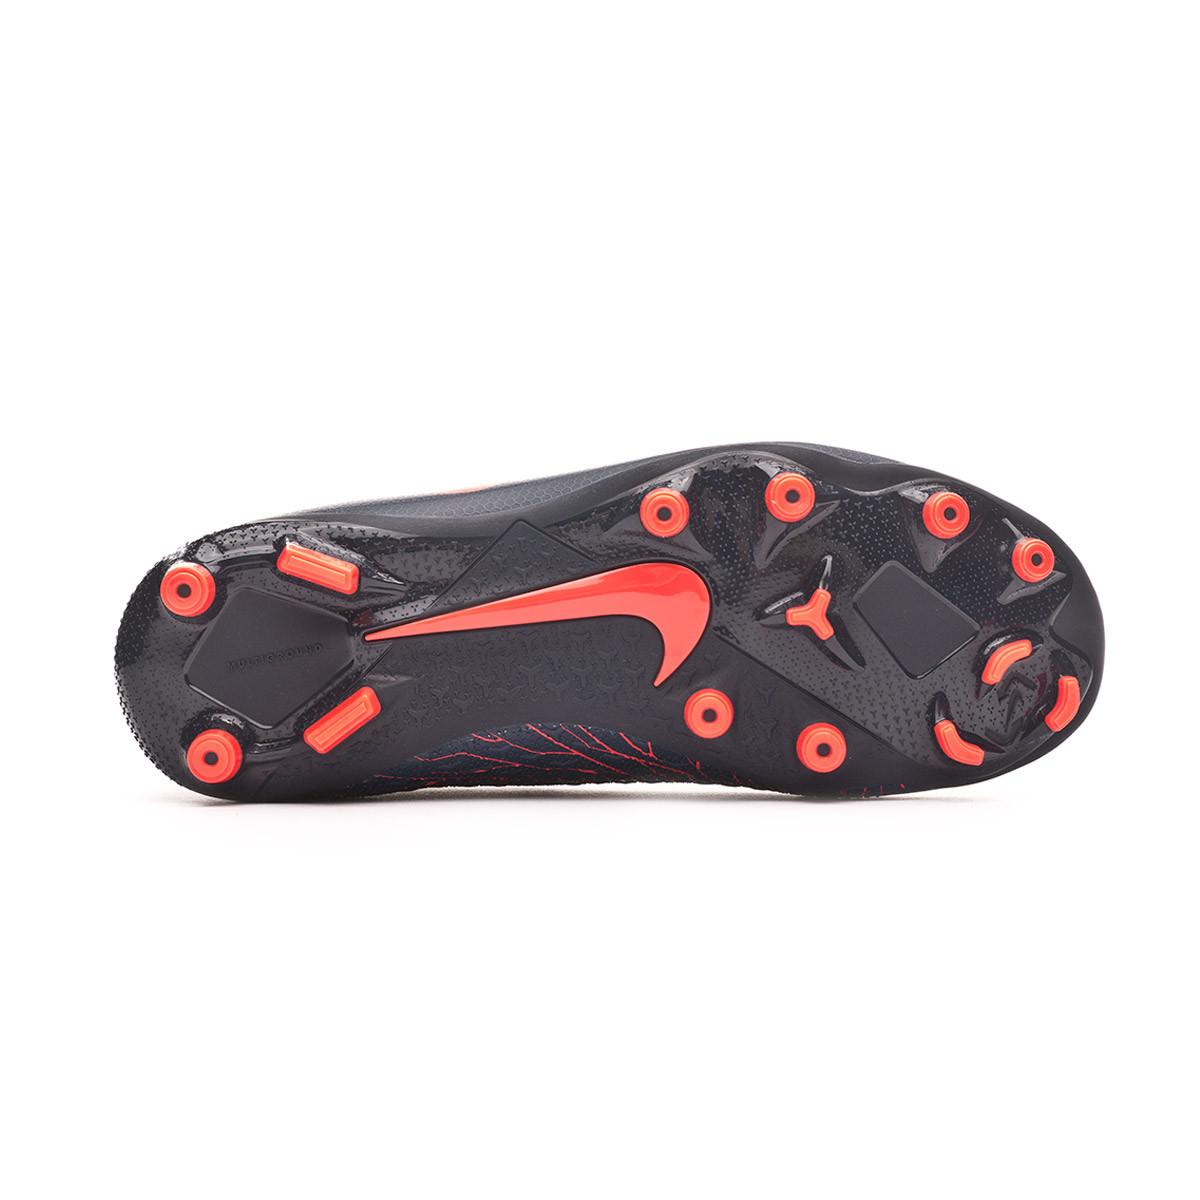 aca1f8b0626 Football Boots Nike Kids Phantom Vision Academy DF FG MG Obsidian-Bright  crimson-Black - Tienda de fútbol Fútbol Emotion